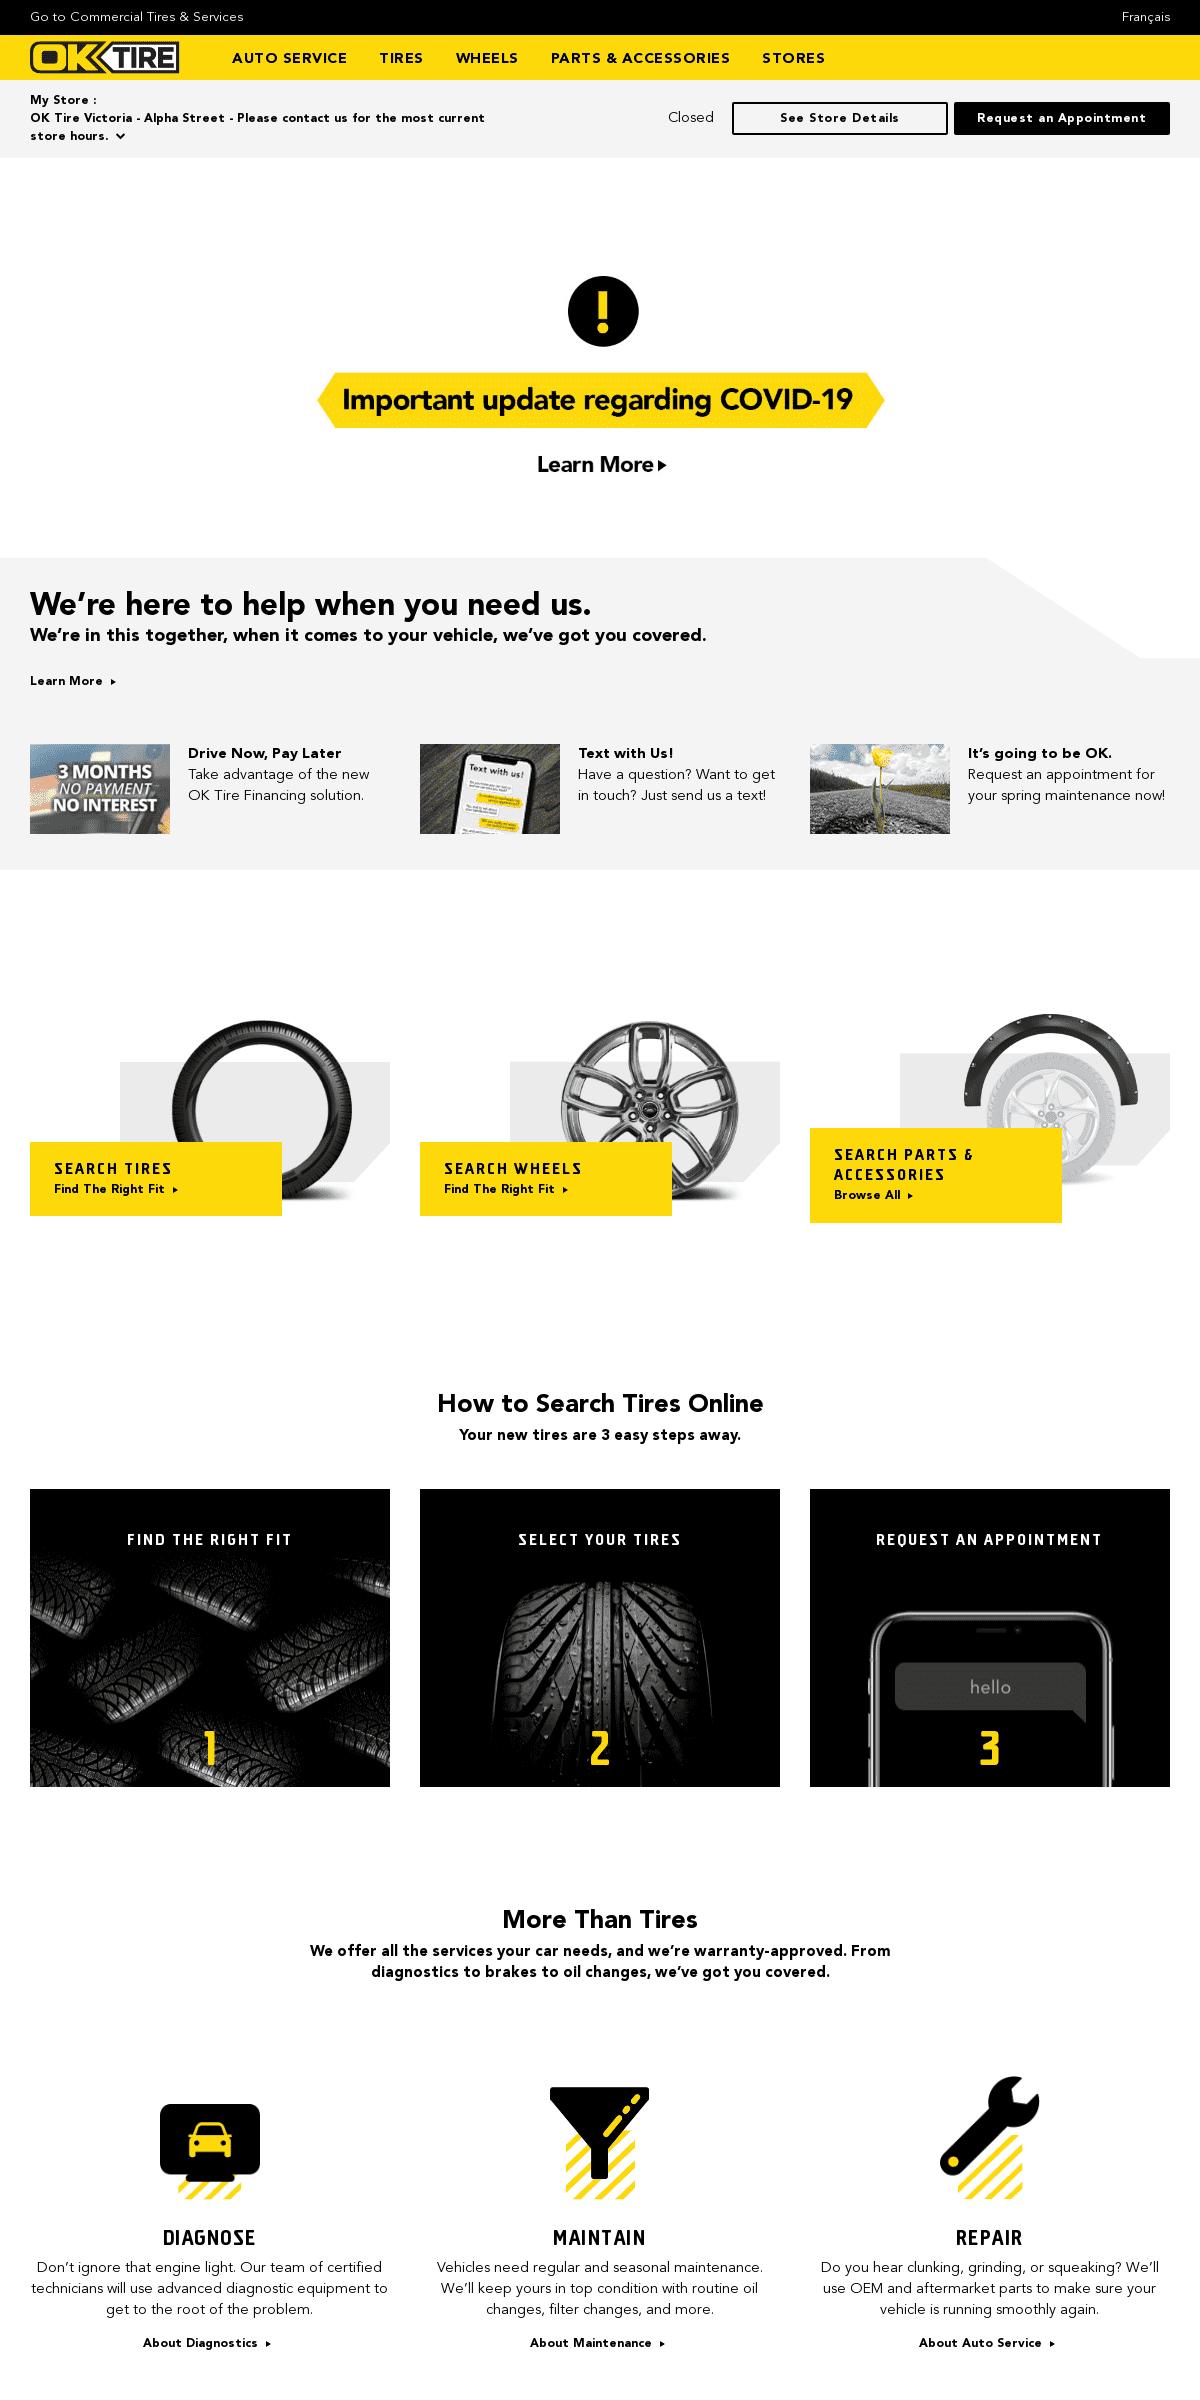 ArchiveBay.com - oktire.com - Home Page - OK Tire - Tires - Auto Service - Brakes - Wheels - Oil Change